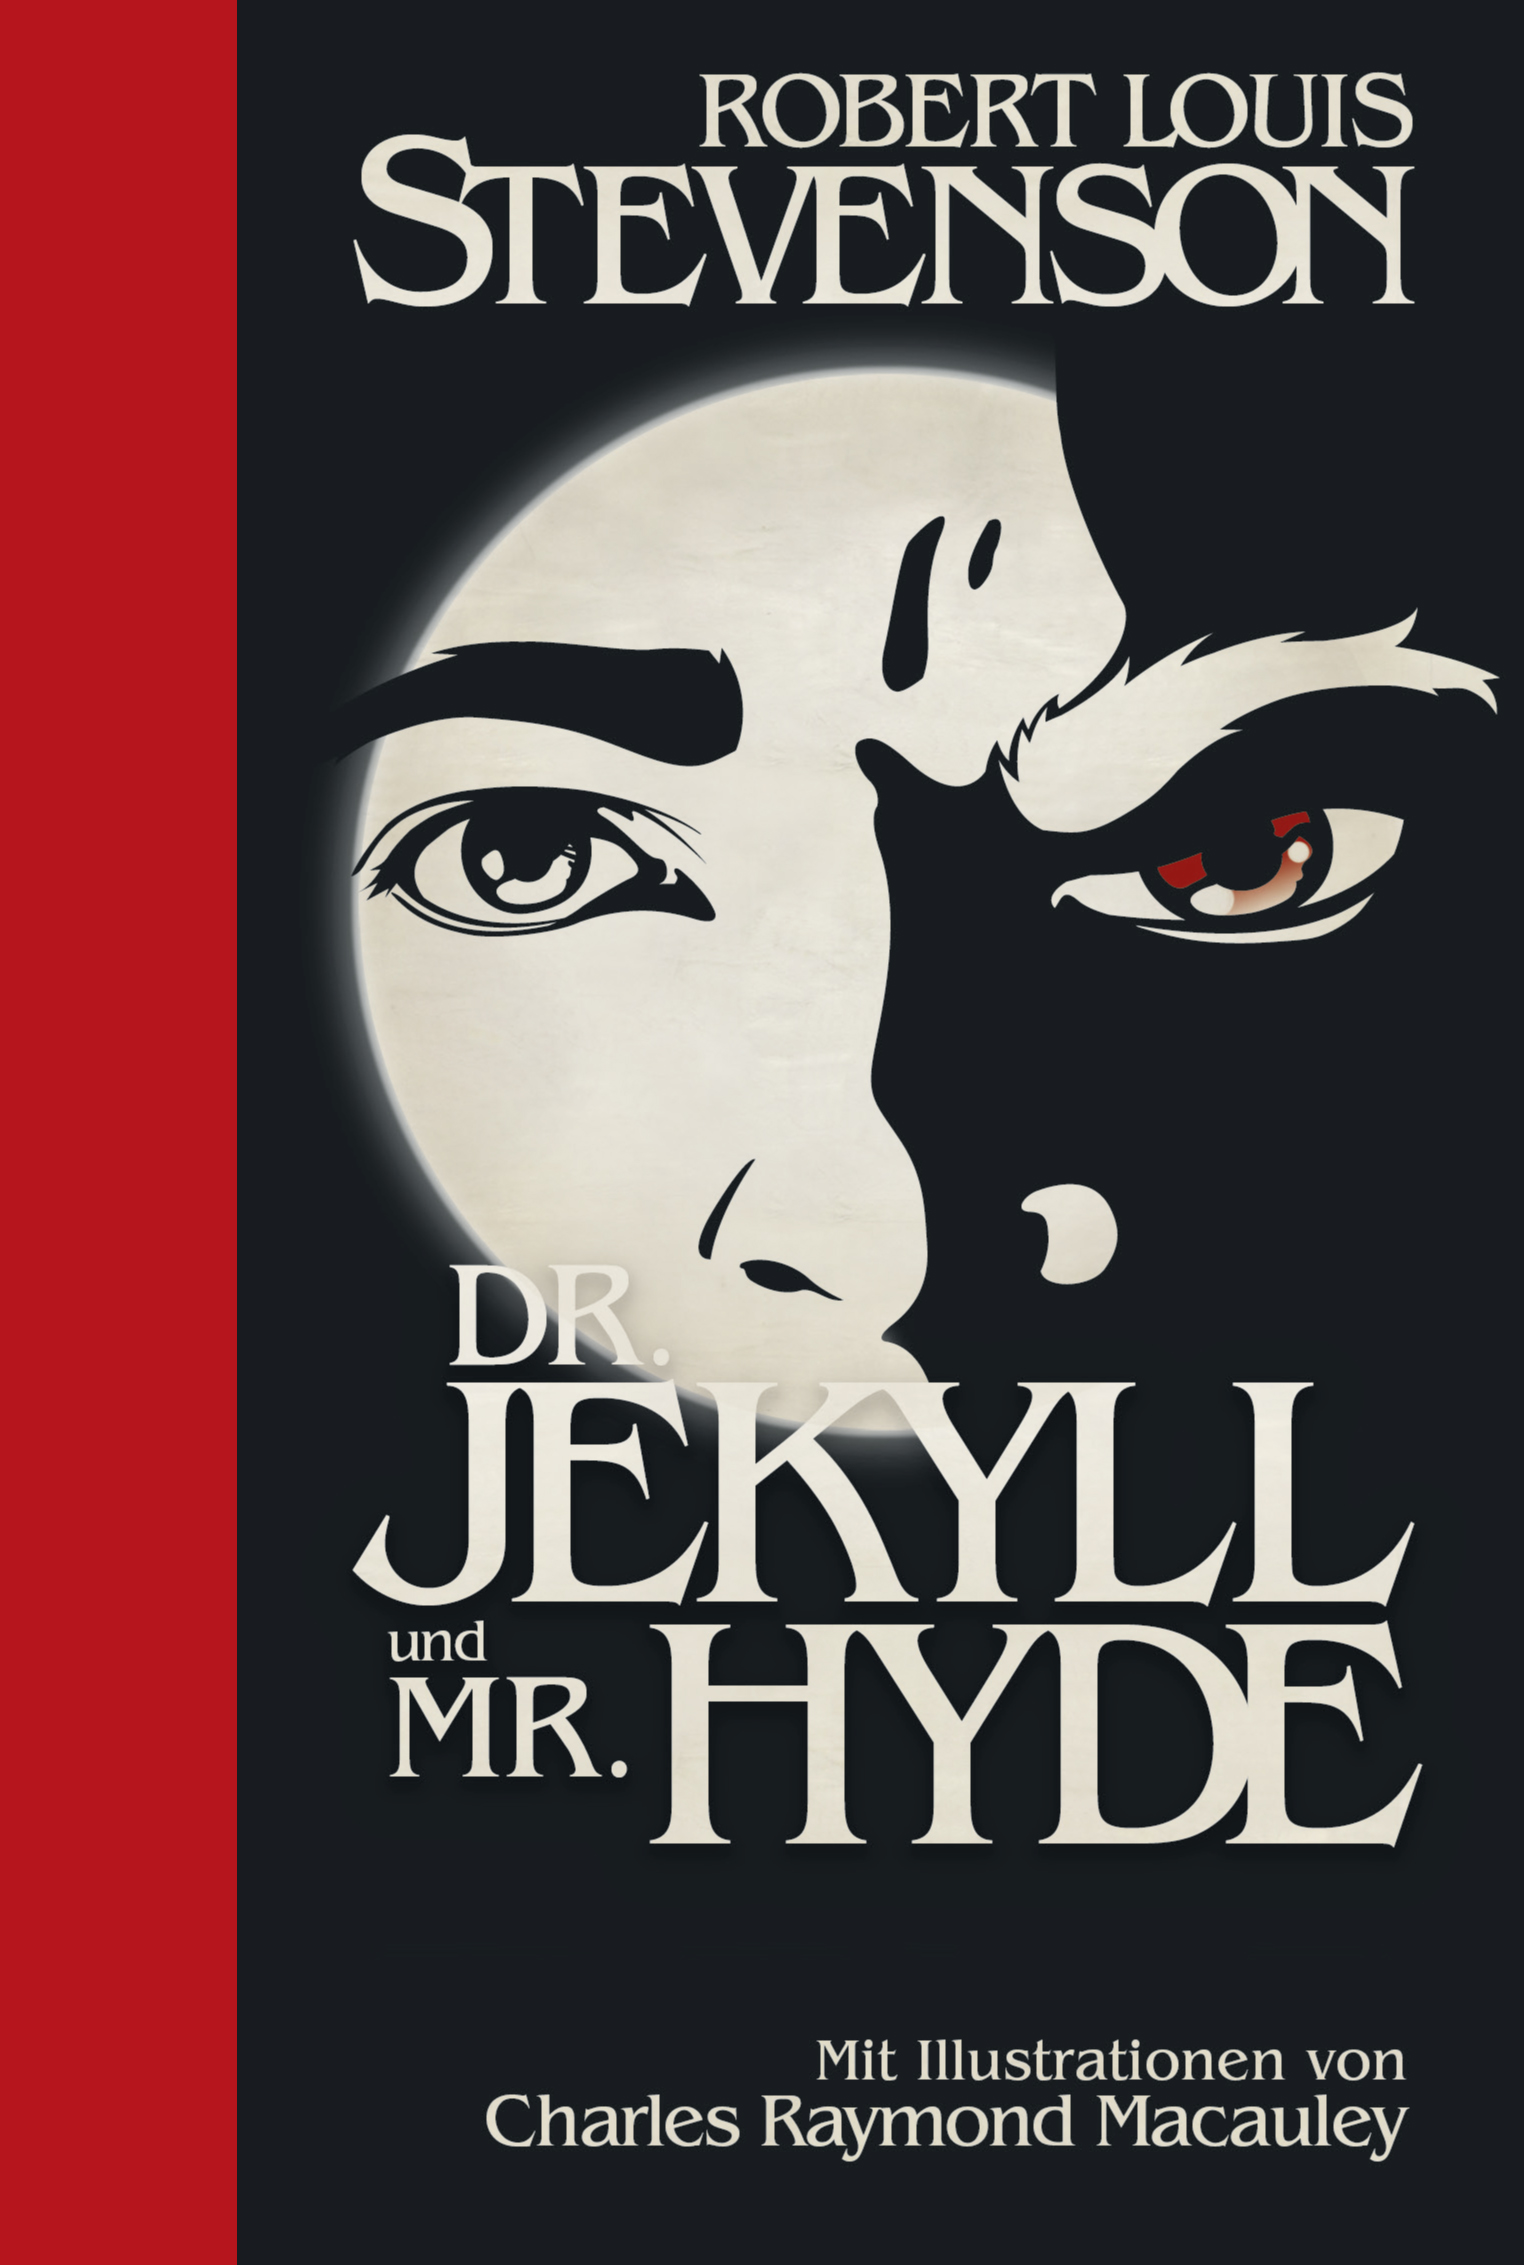 U1_Jekyll-Hyde_300dpi